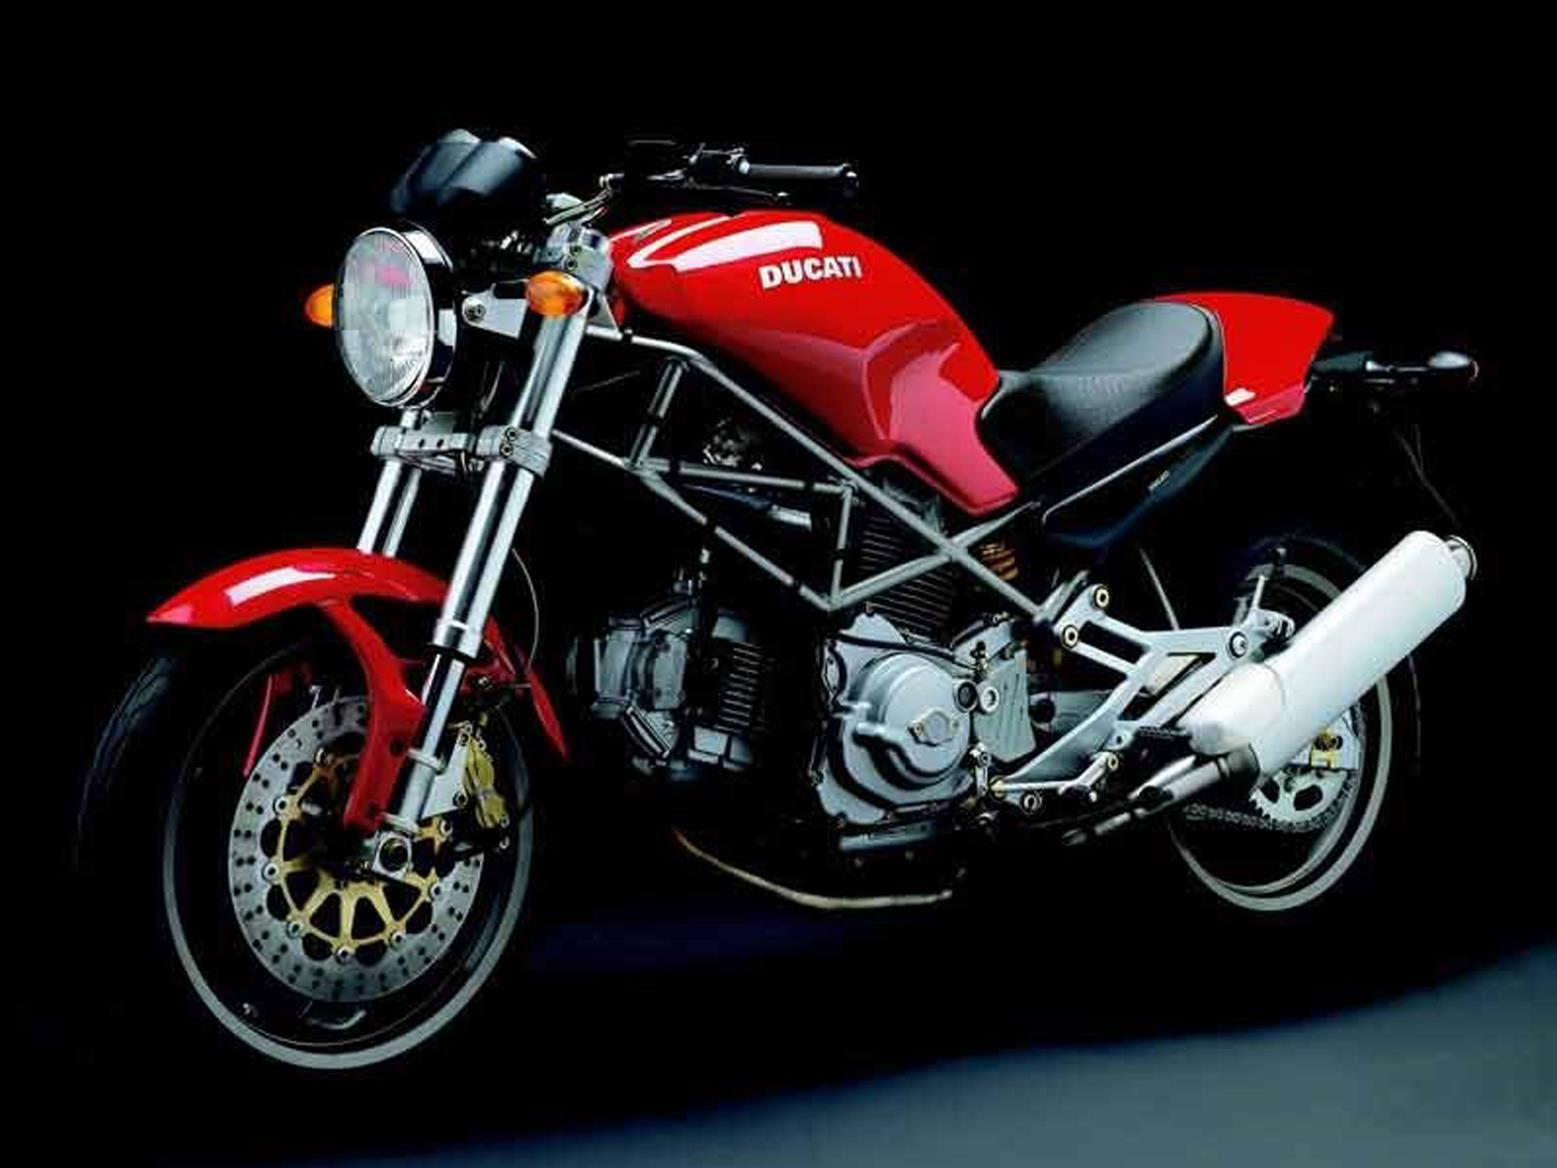 Ducati M600 Monster